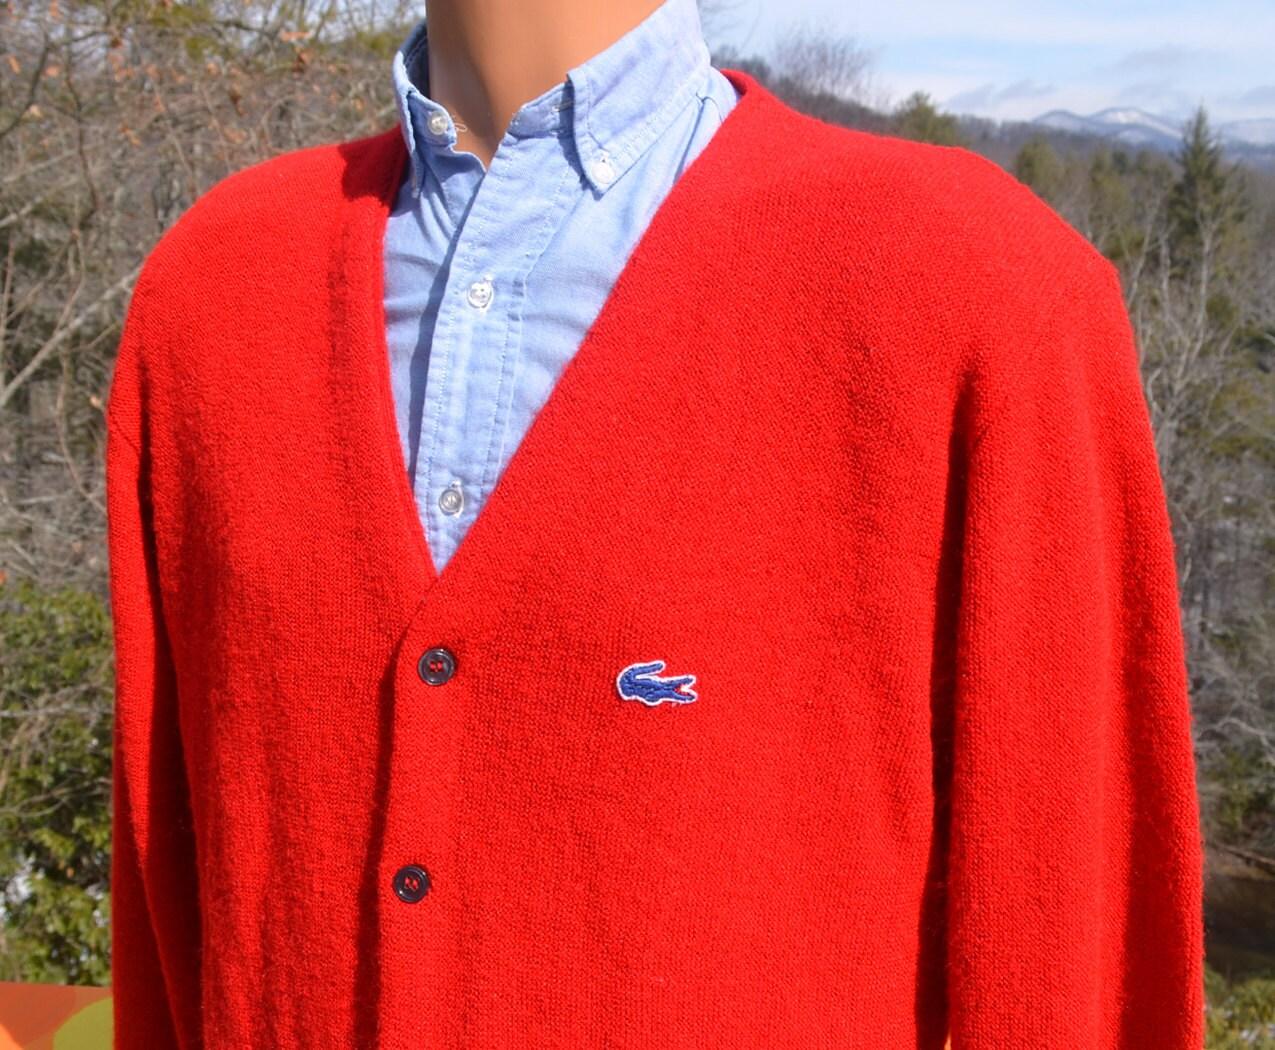 Knitting Patterns For Golf Jumpers : 70s vintage izod lacoste CARDIGAN sweater golf knit v-neck red